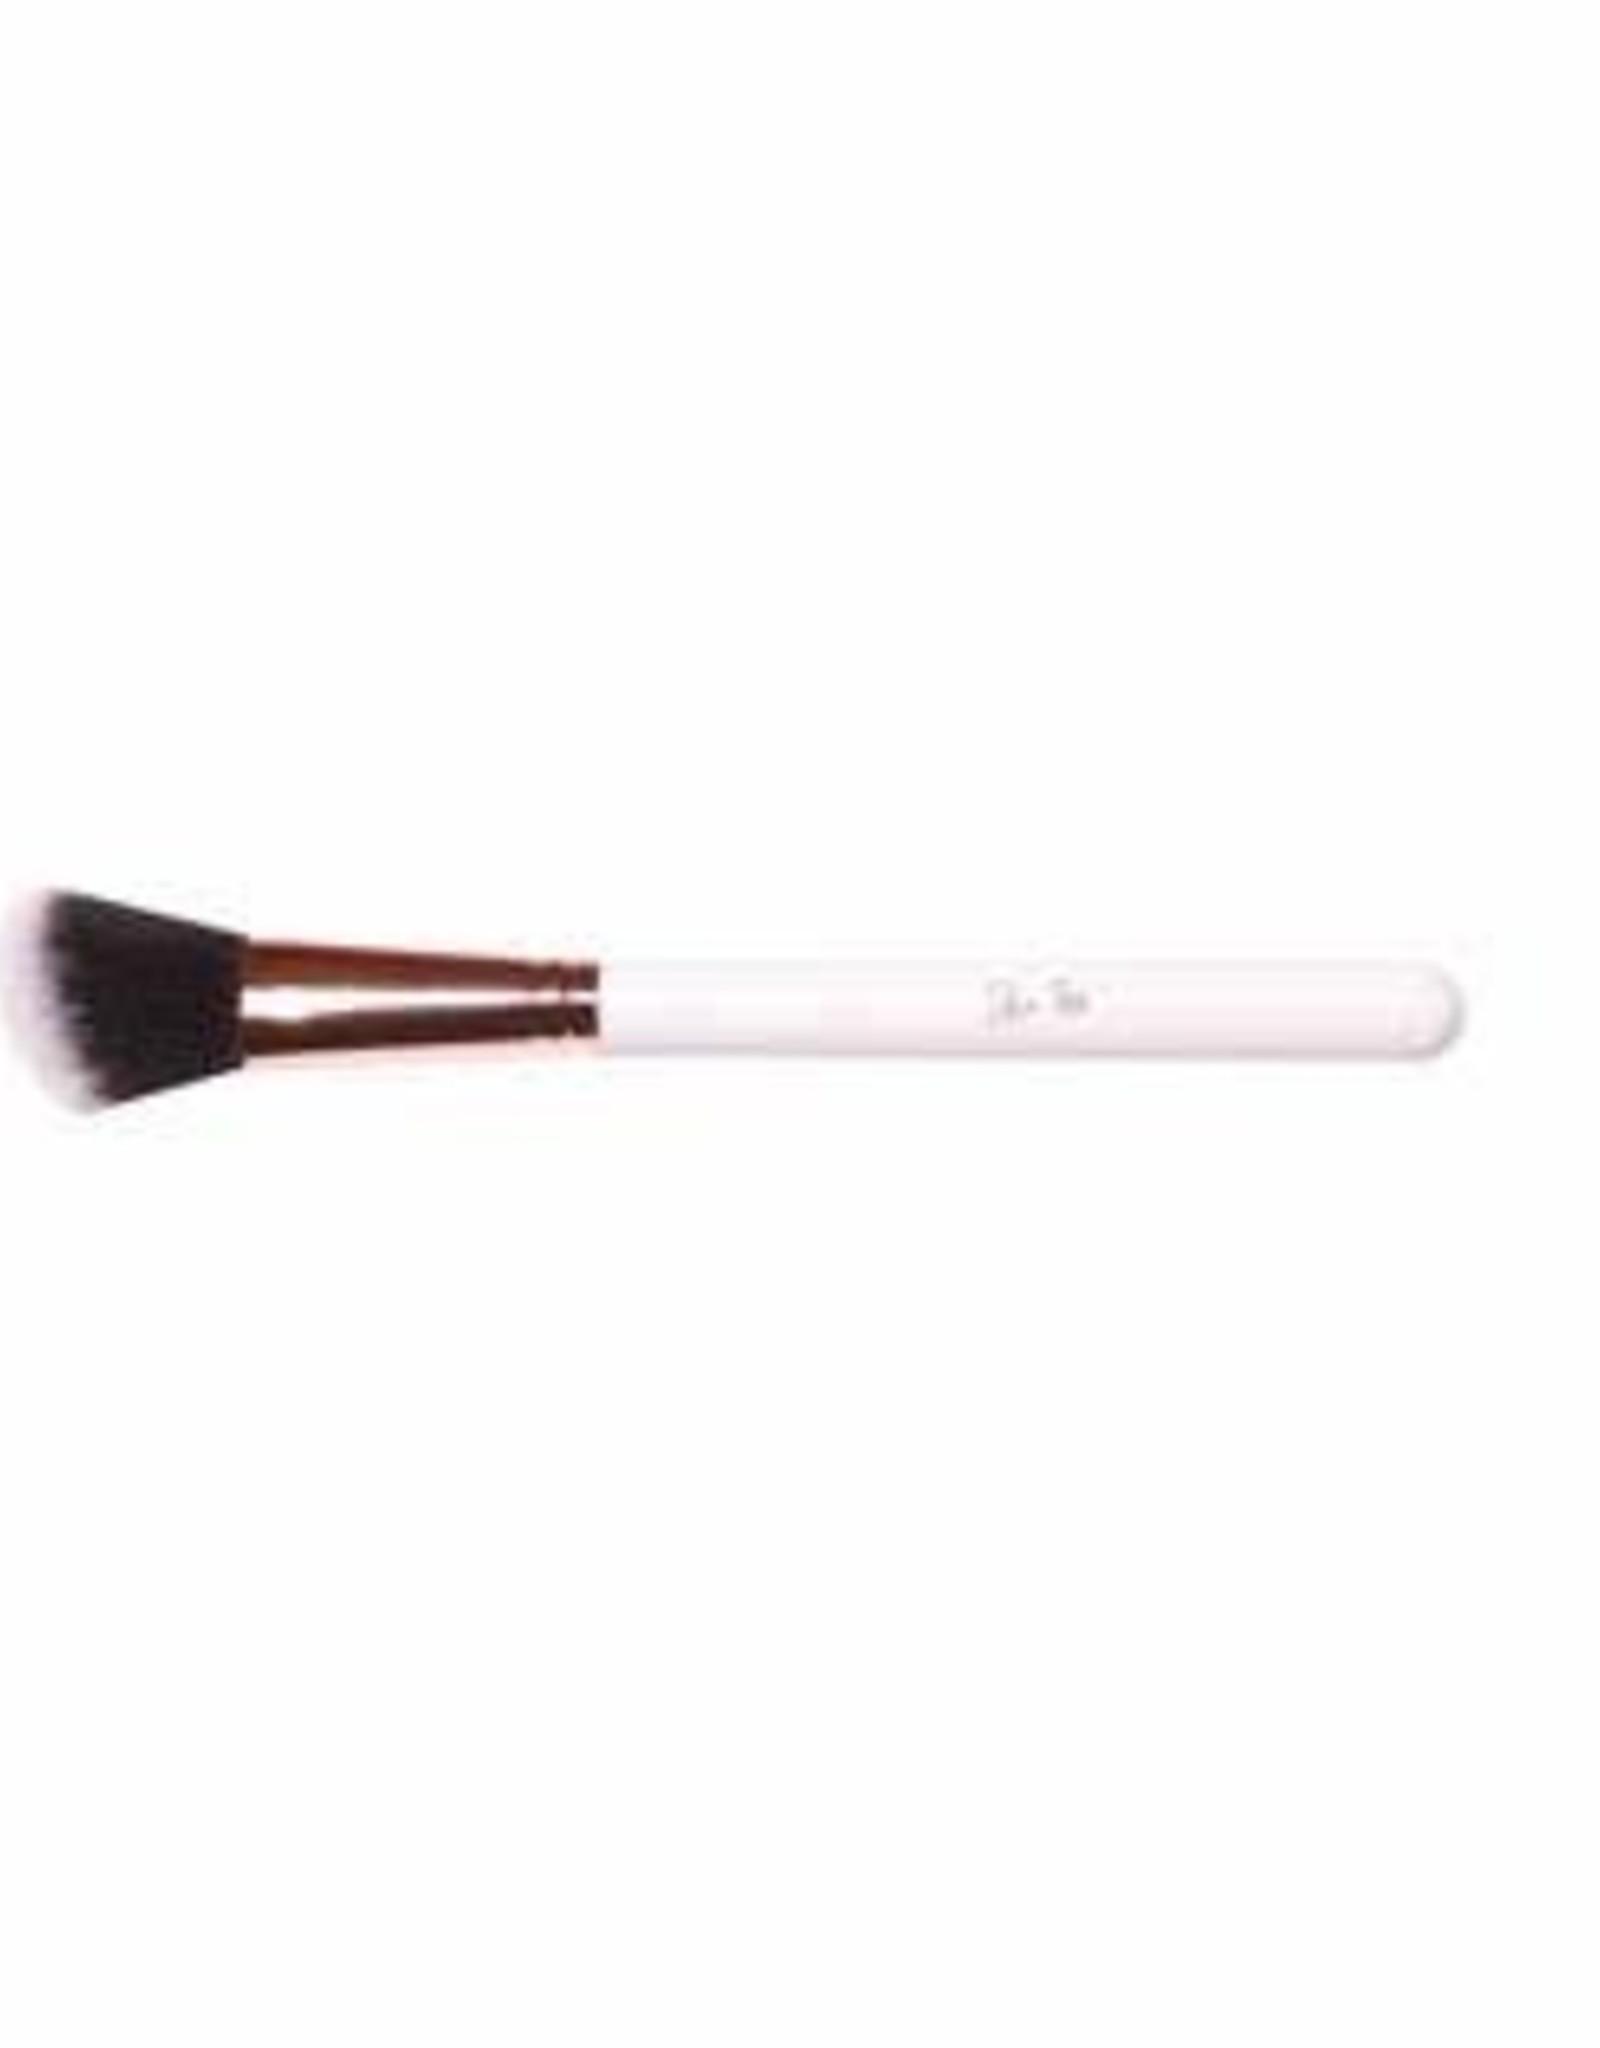 She-Iss - Blush brush